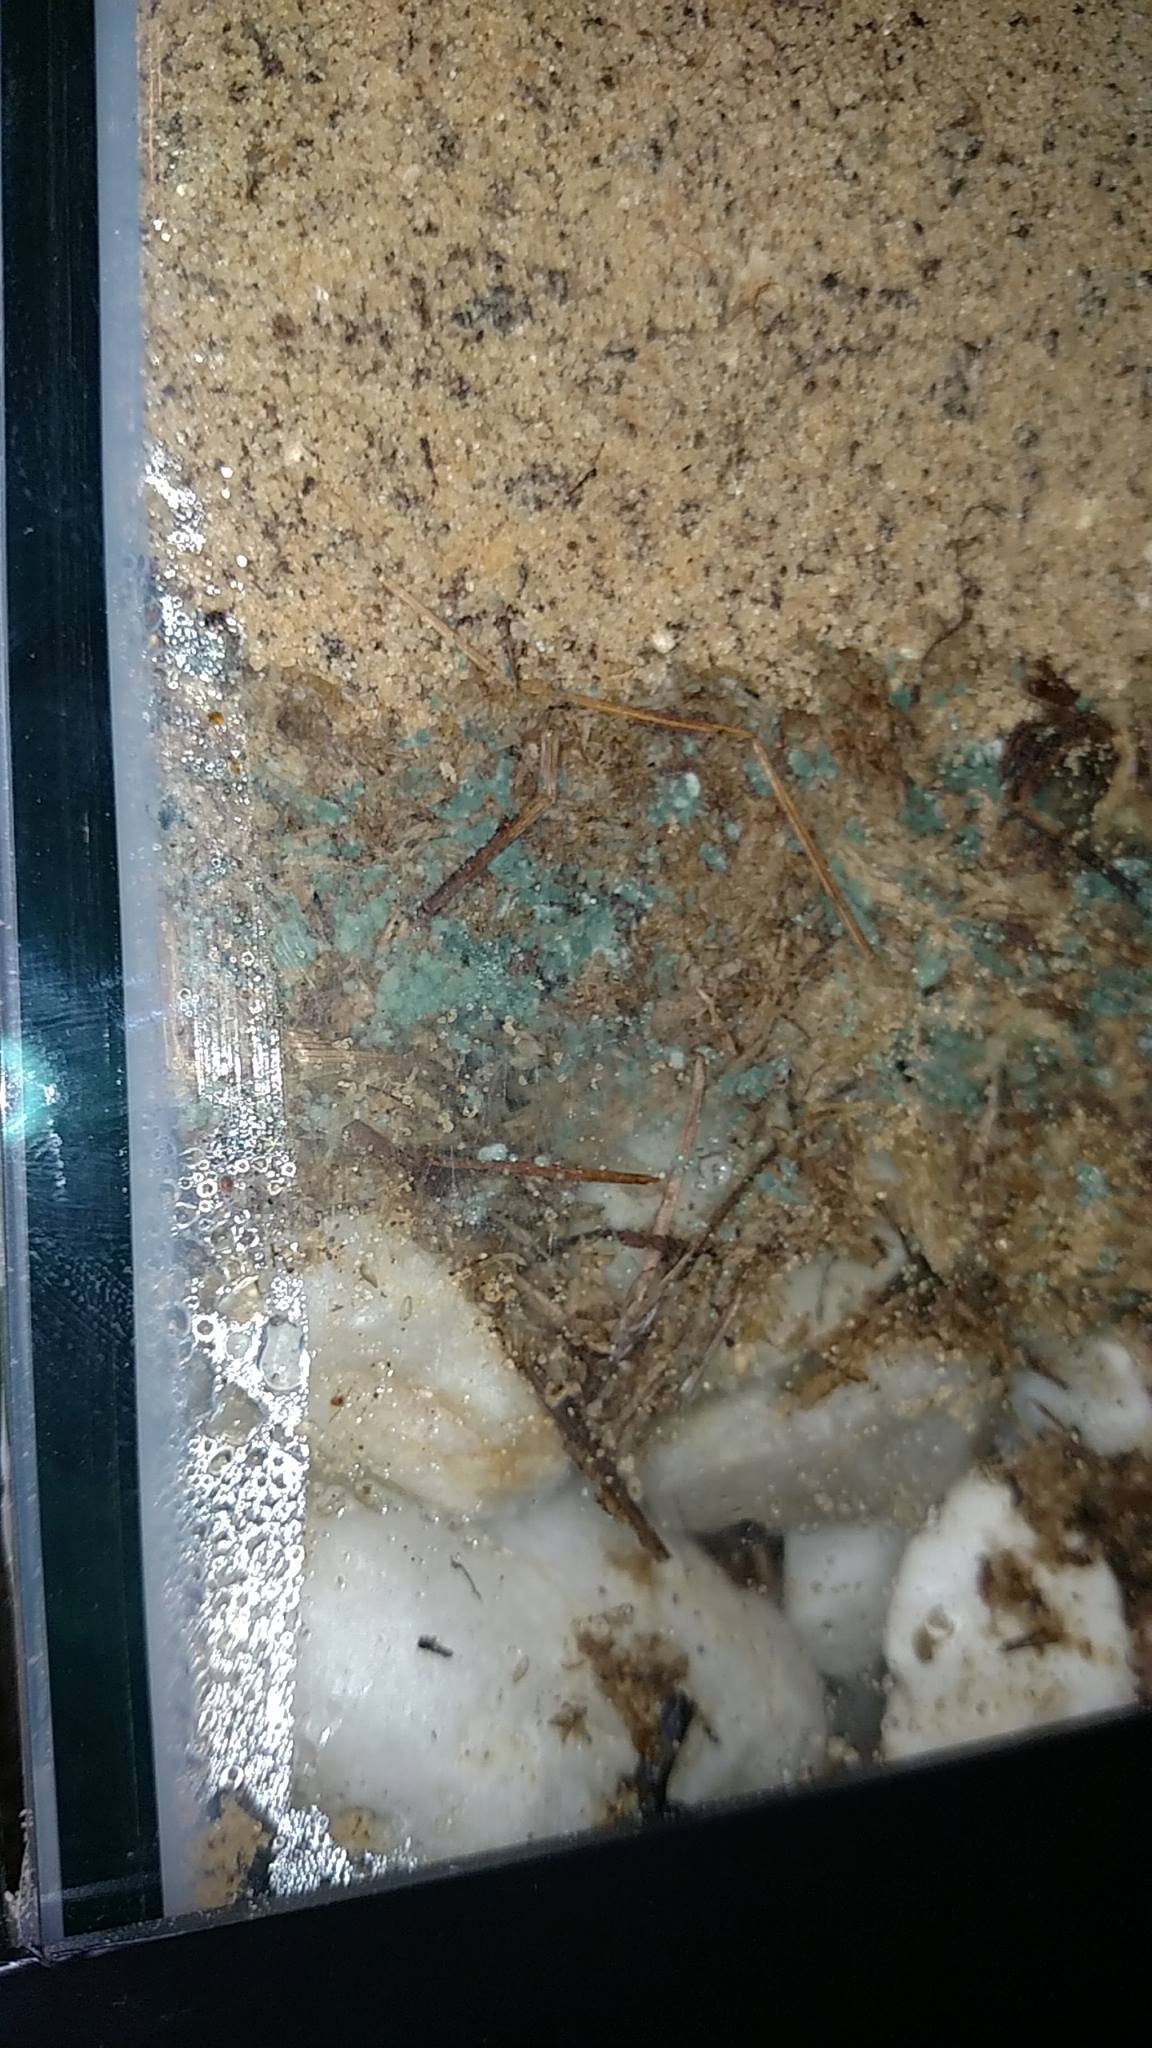 Photo Credit: Mary Milhorn Trichoderma outbreak in spaghnum moss